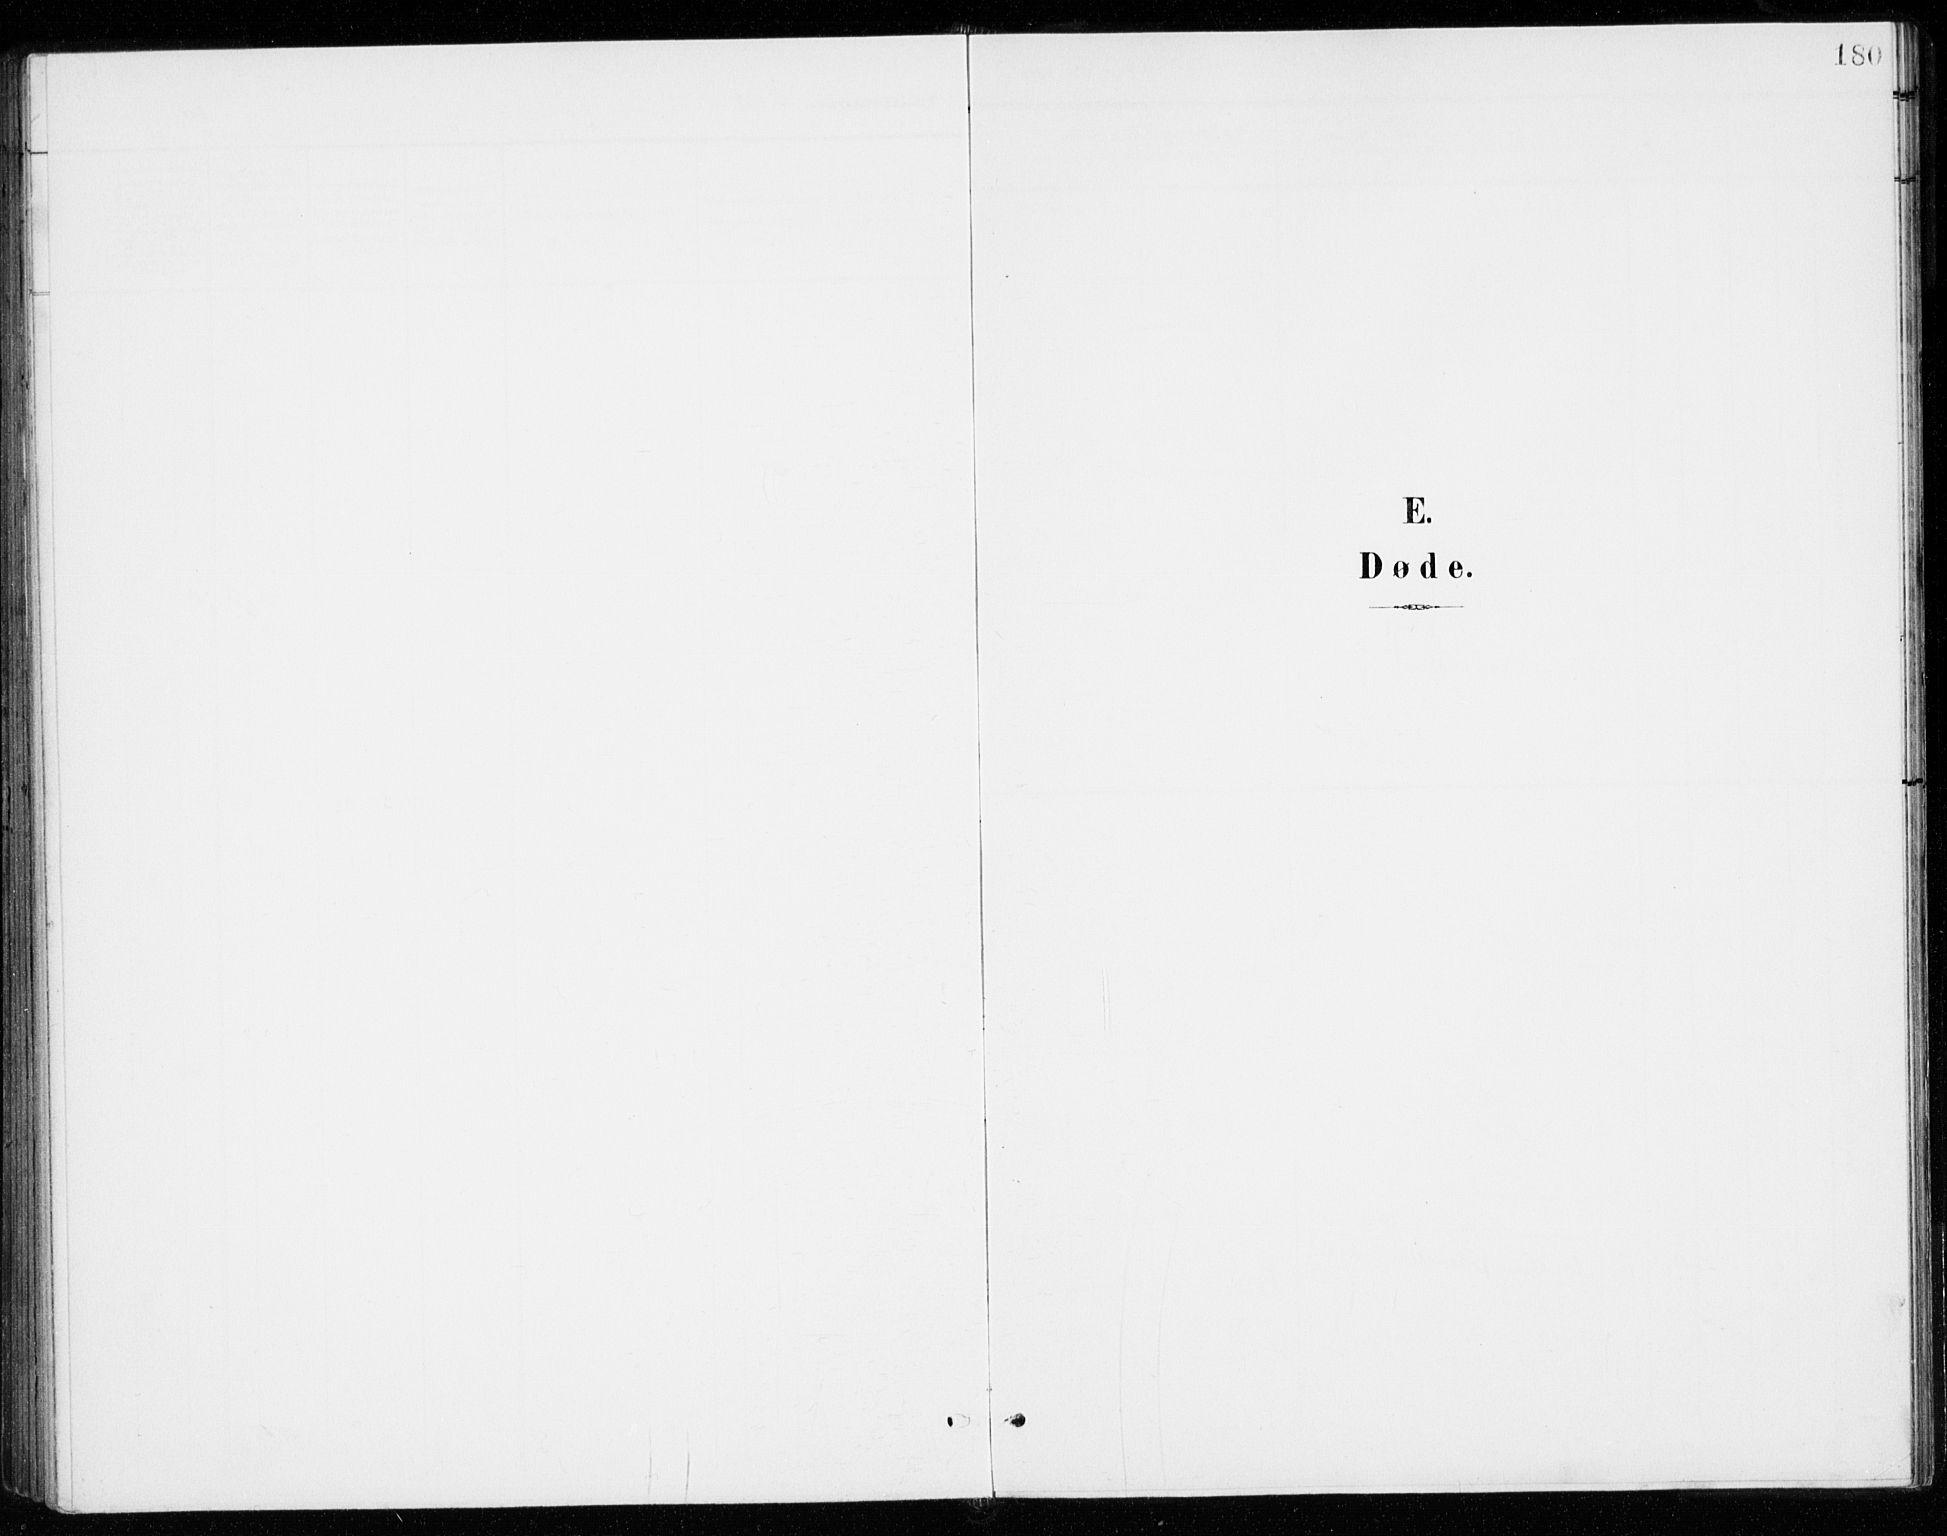 SAO, Gjerdrum prestekontor Kirkebøker, G/Gb/L0001: Klokkerbok nr. II 1, 1901-1944, s. 180